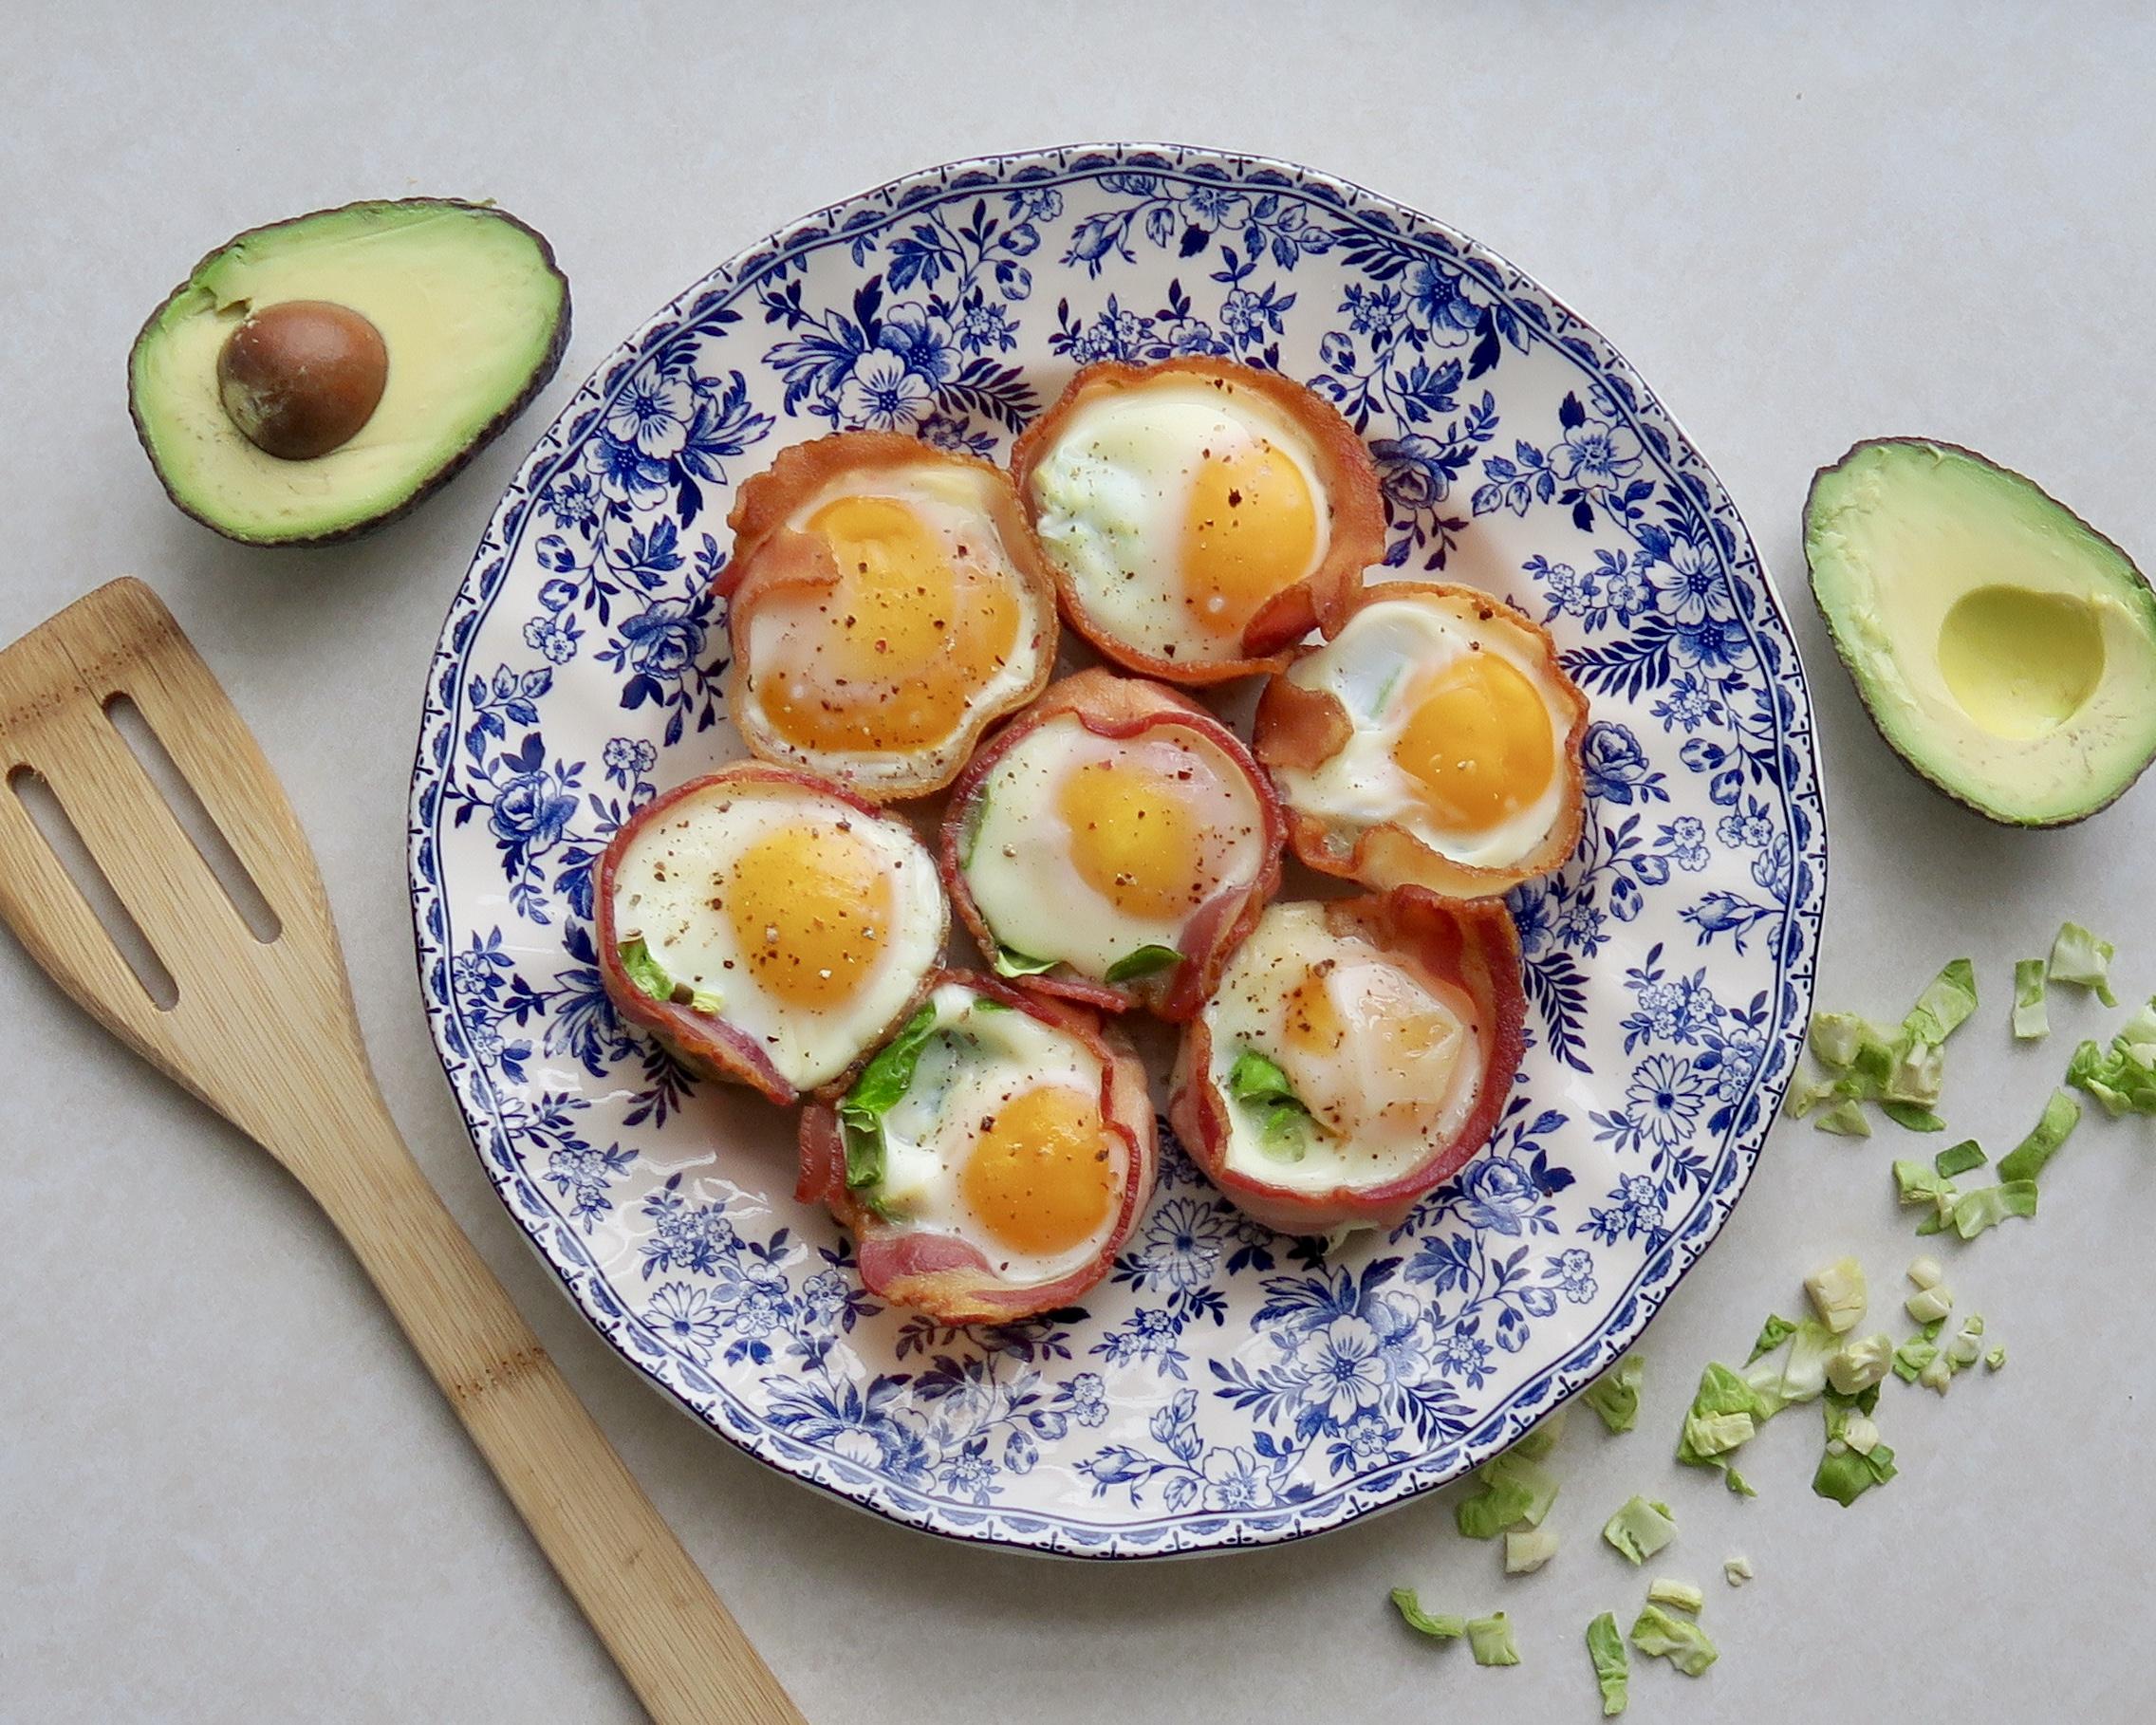 Bacon & Veg Egg Cups, Lake Superior Kitchen, Whole30, Paleo, Grain Free, Breakfast